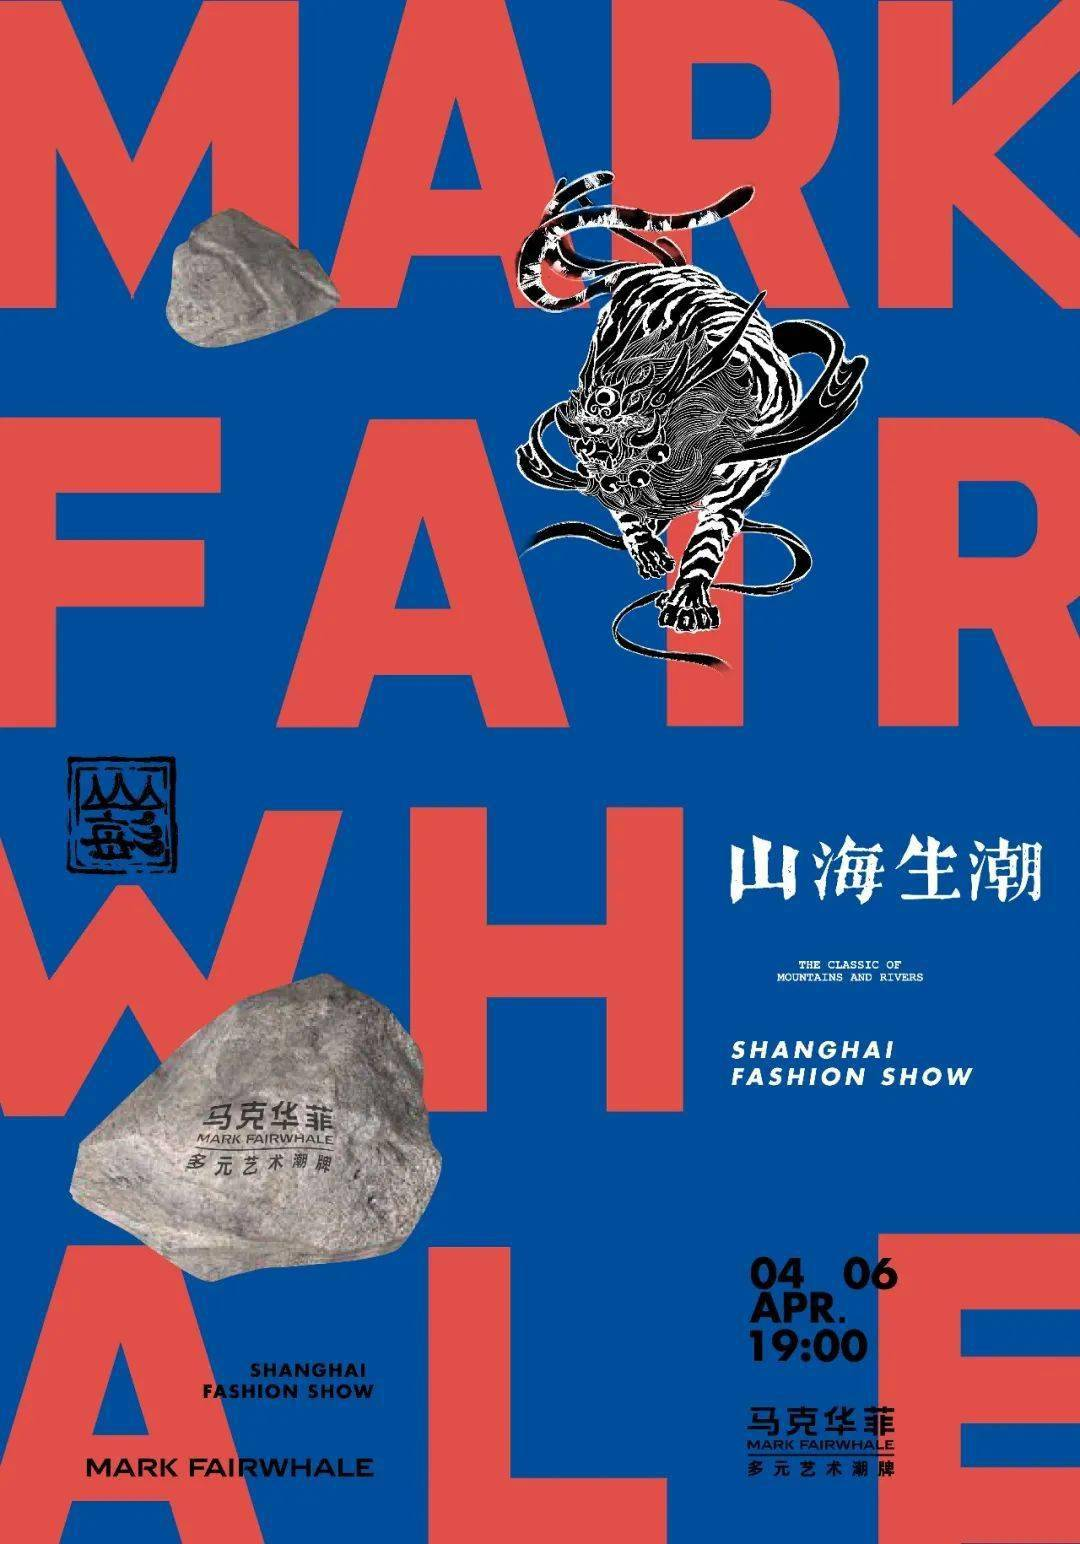 AW21上海时装周马克华菲MARK FAIRWHALE-家庭网